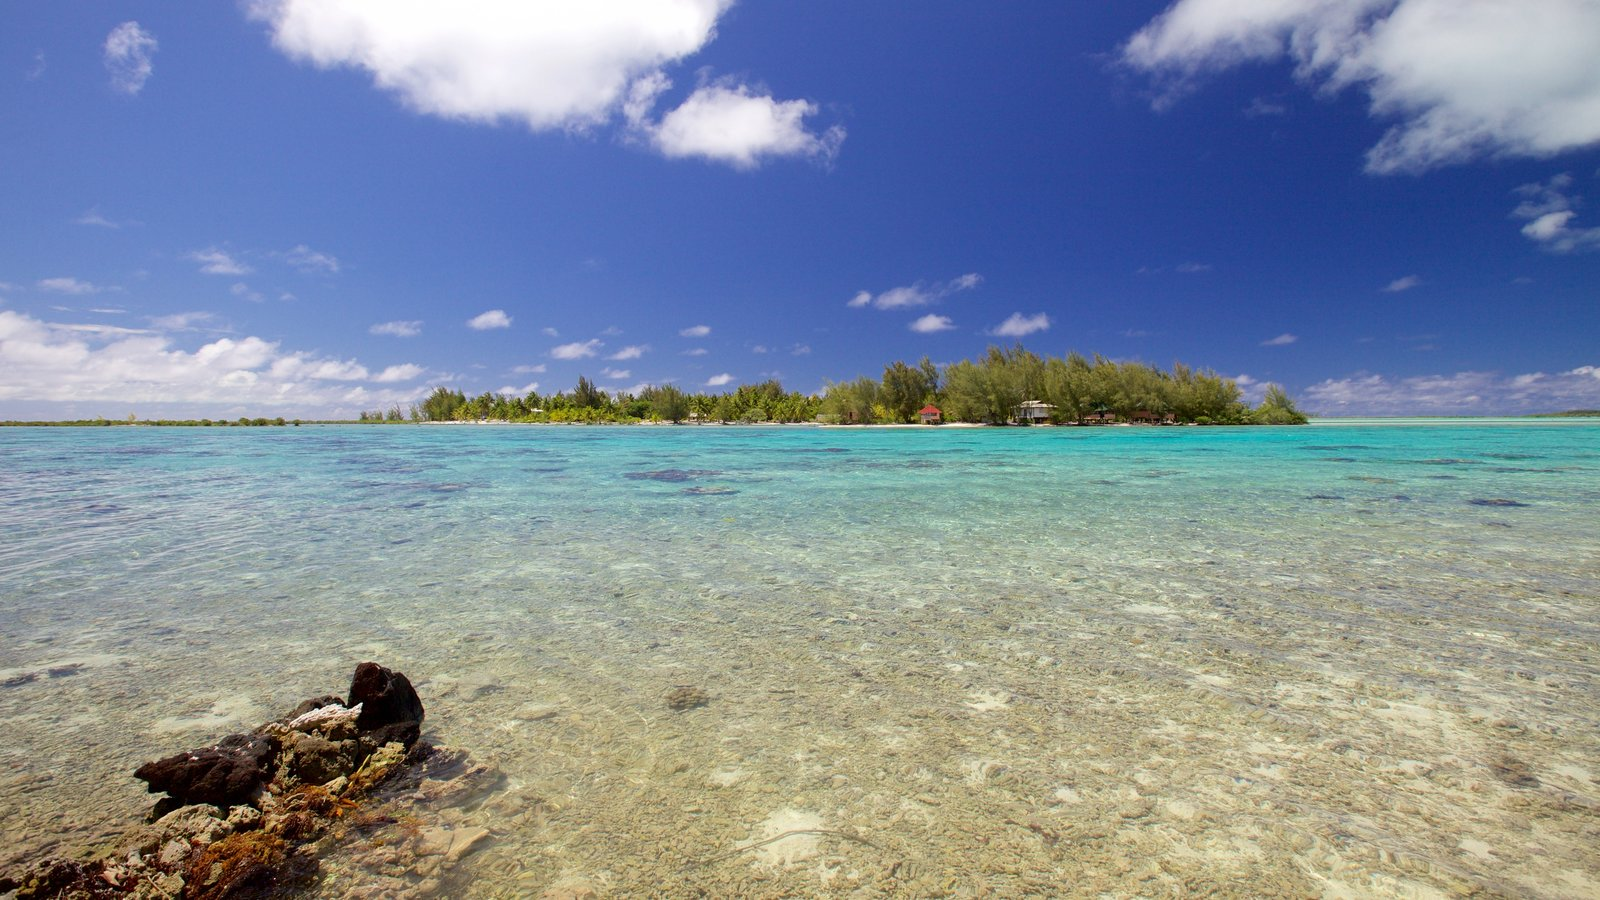 Bora Bora which includes general coastal views, landscape views and tropical scenes